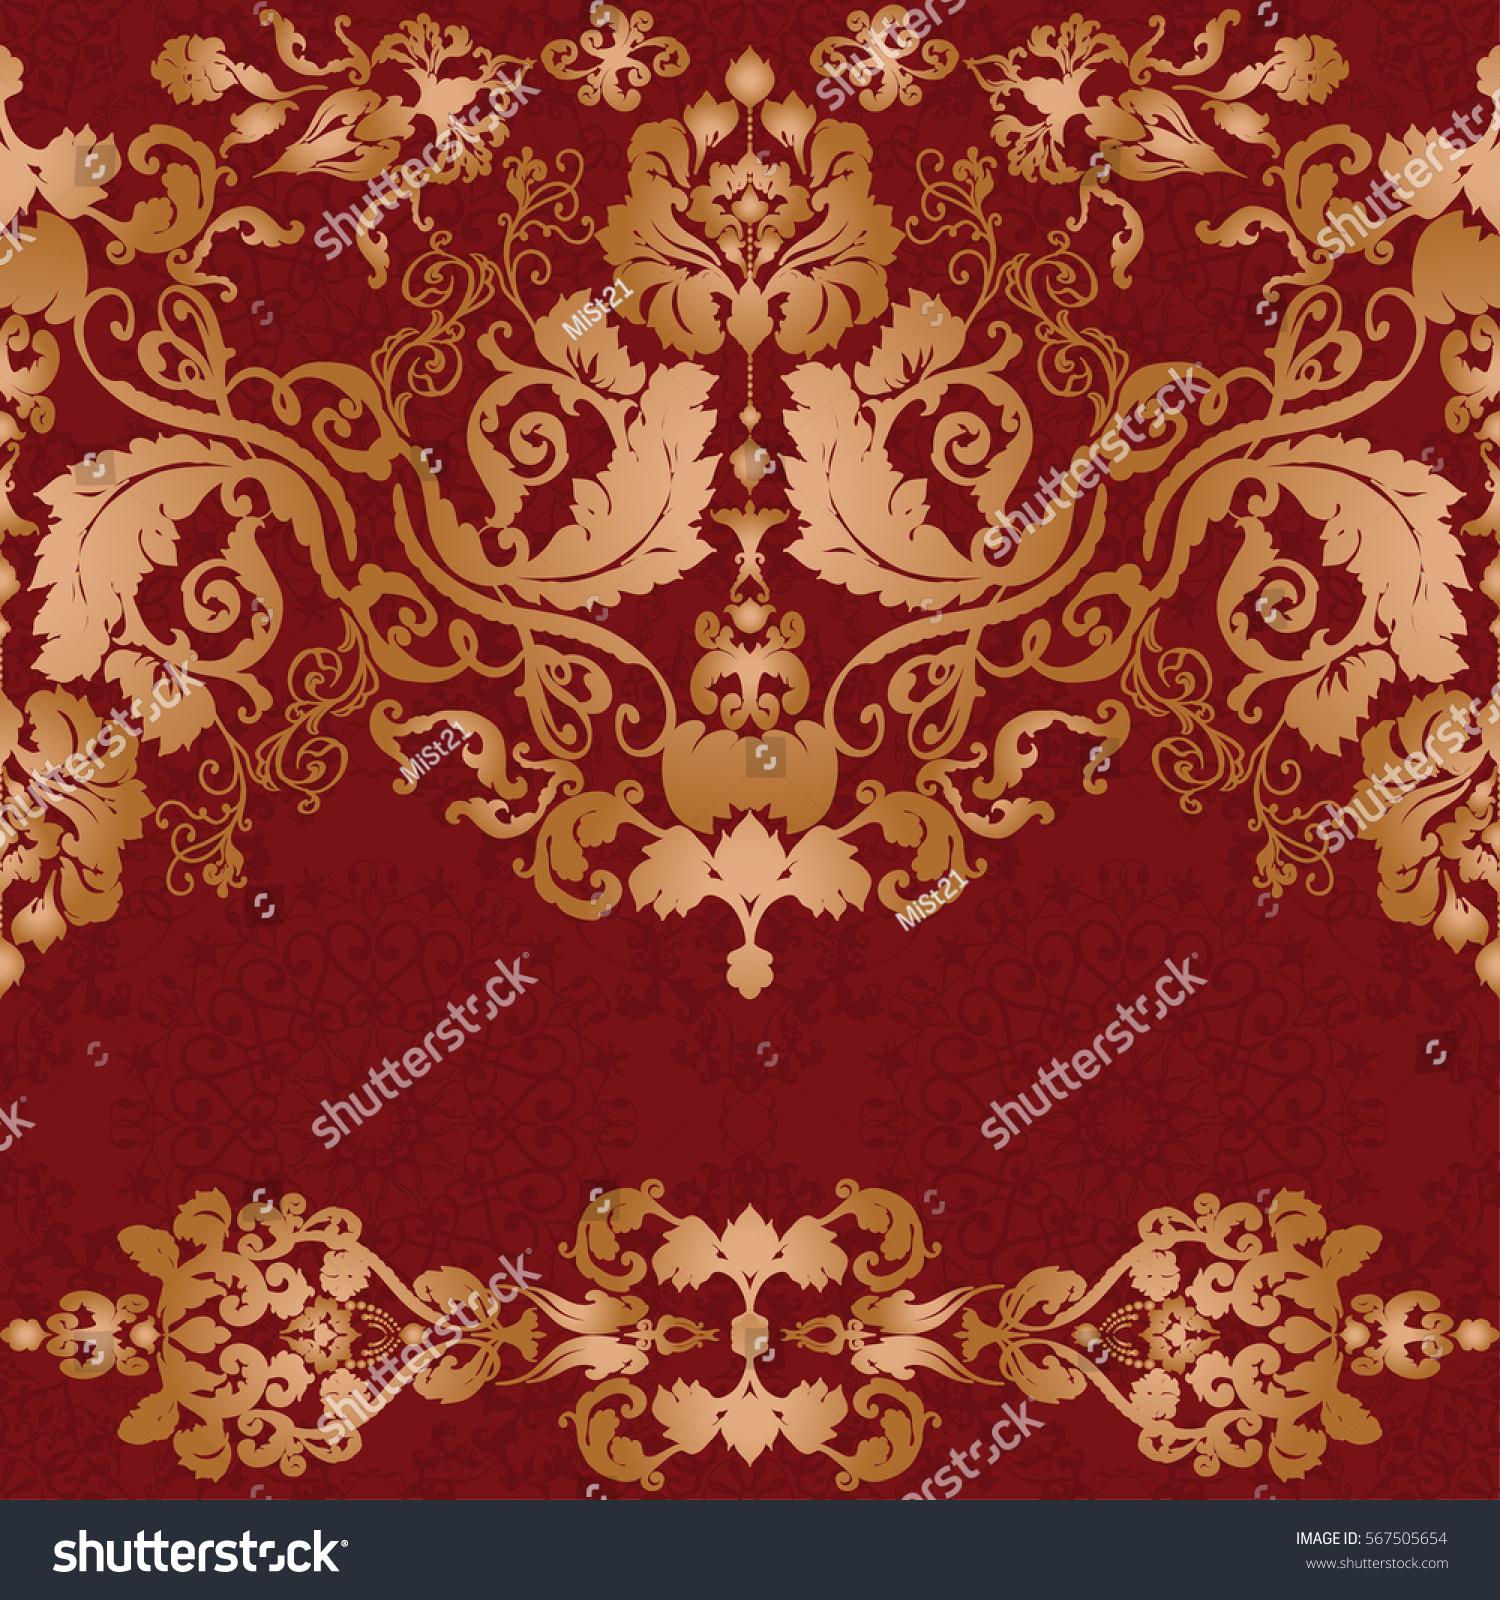 Vector Illustration Cards Wedding Invitations Stock Vector (Royalty ...